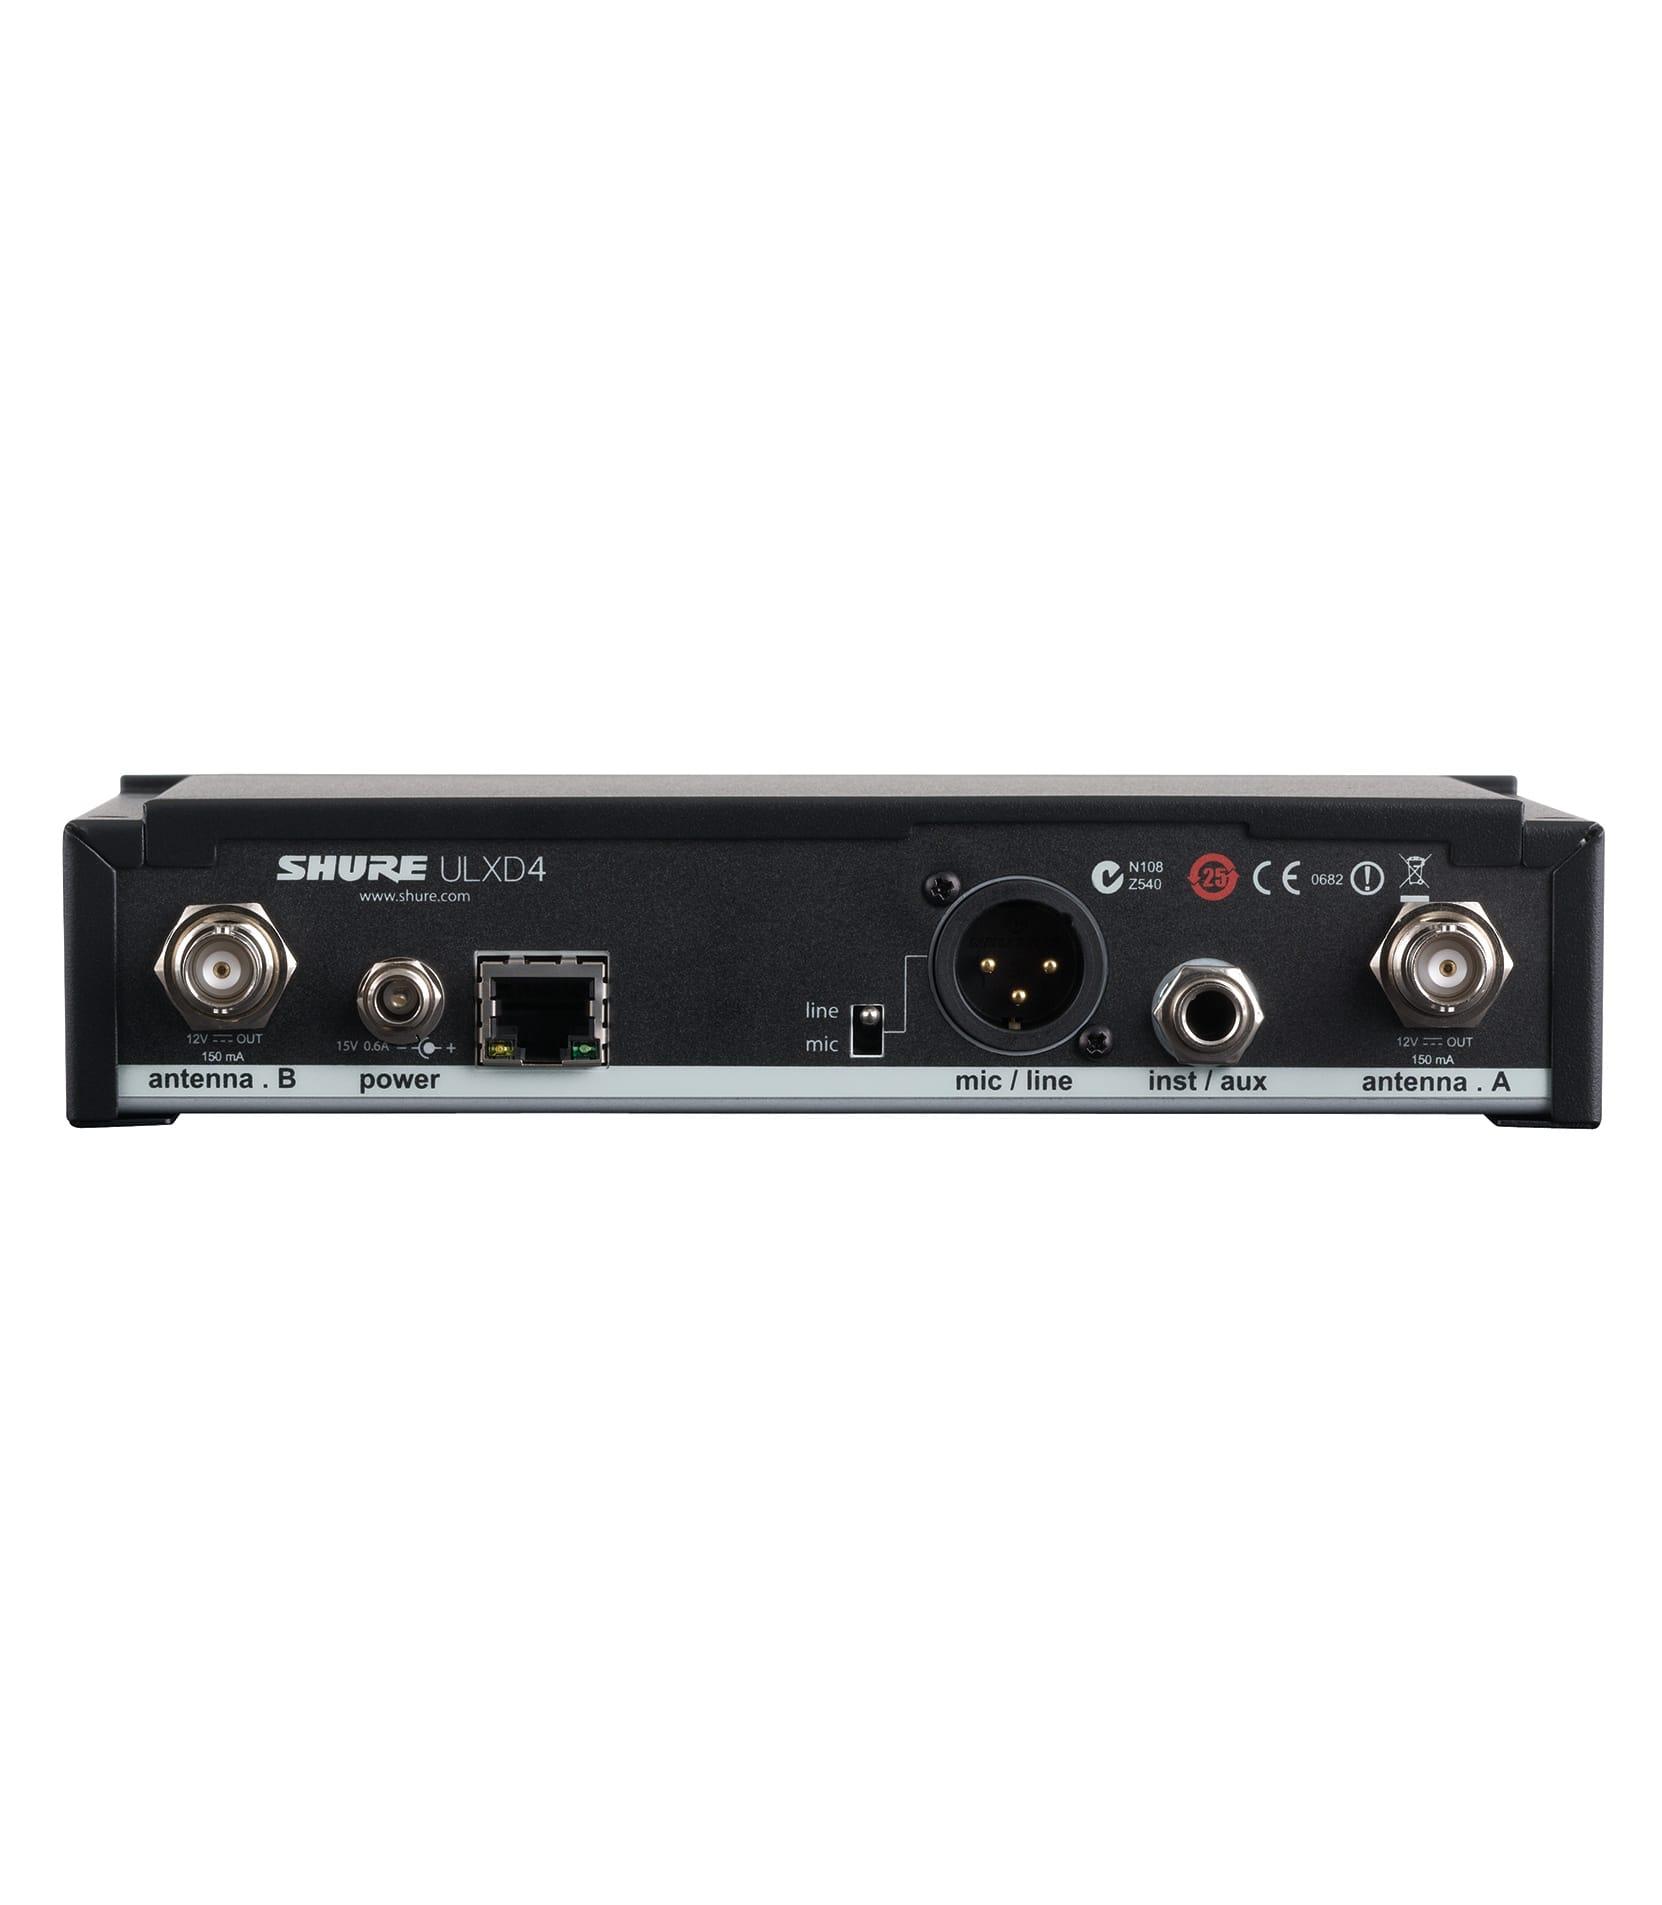 ULXD4UK K51 - Buy Online